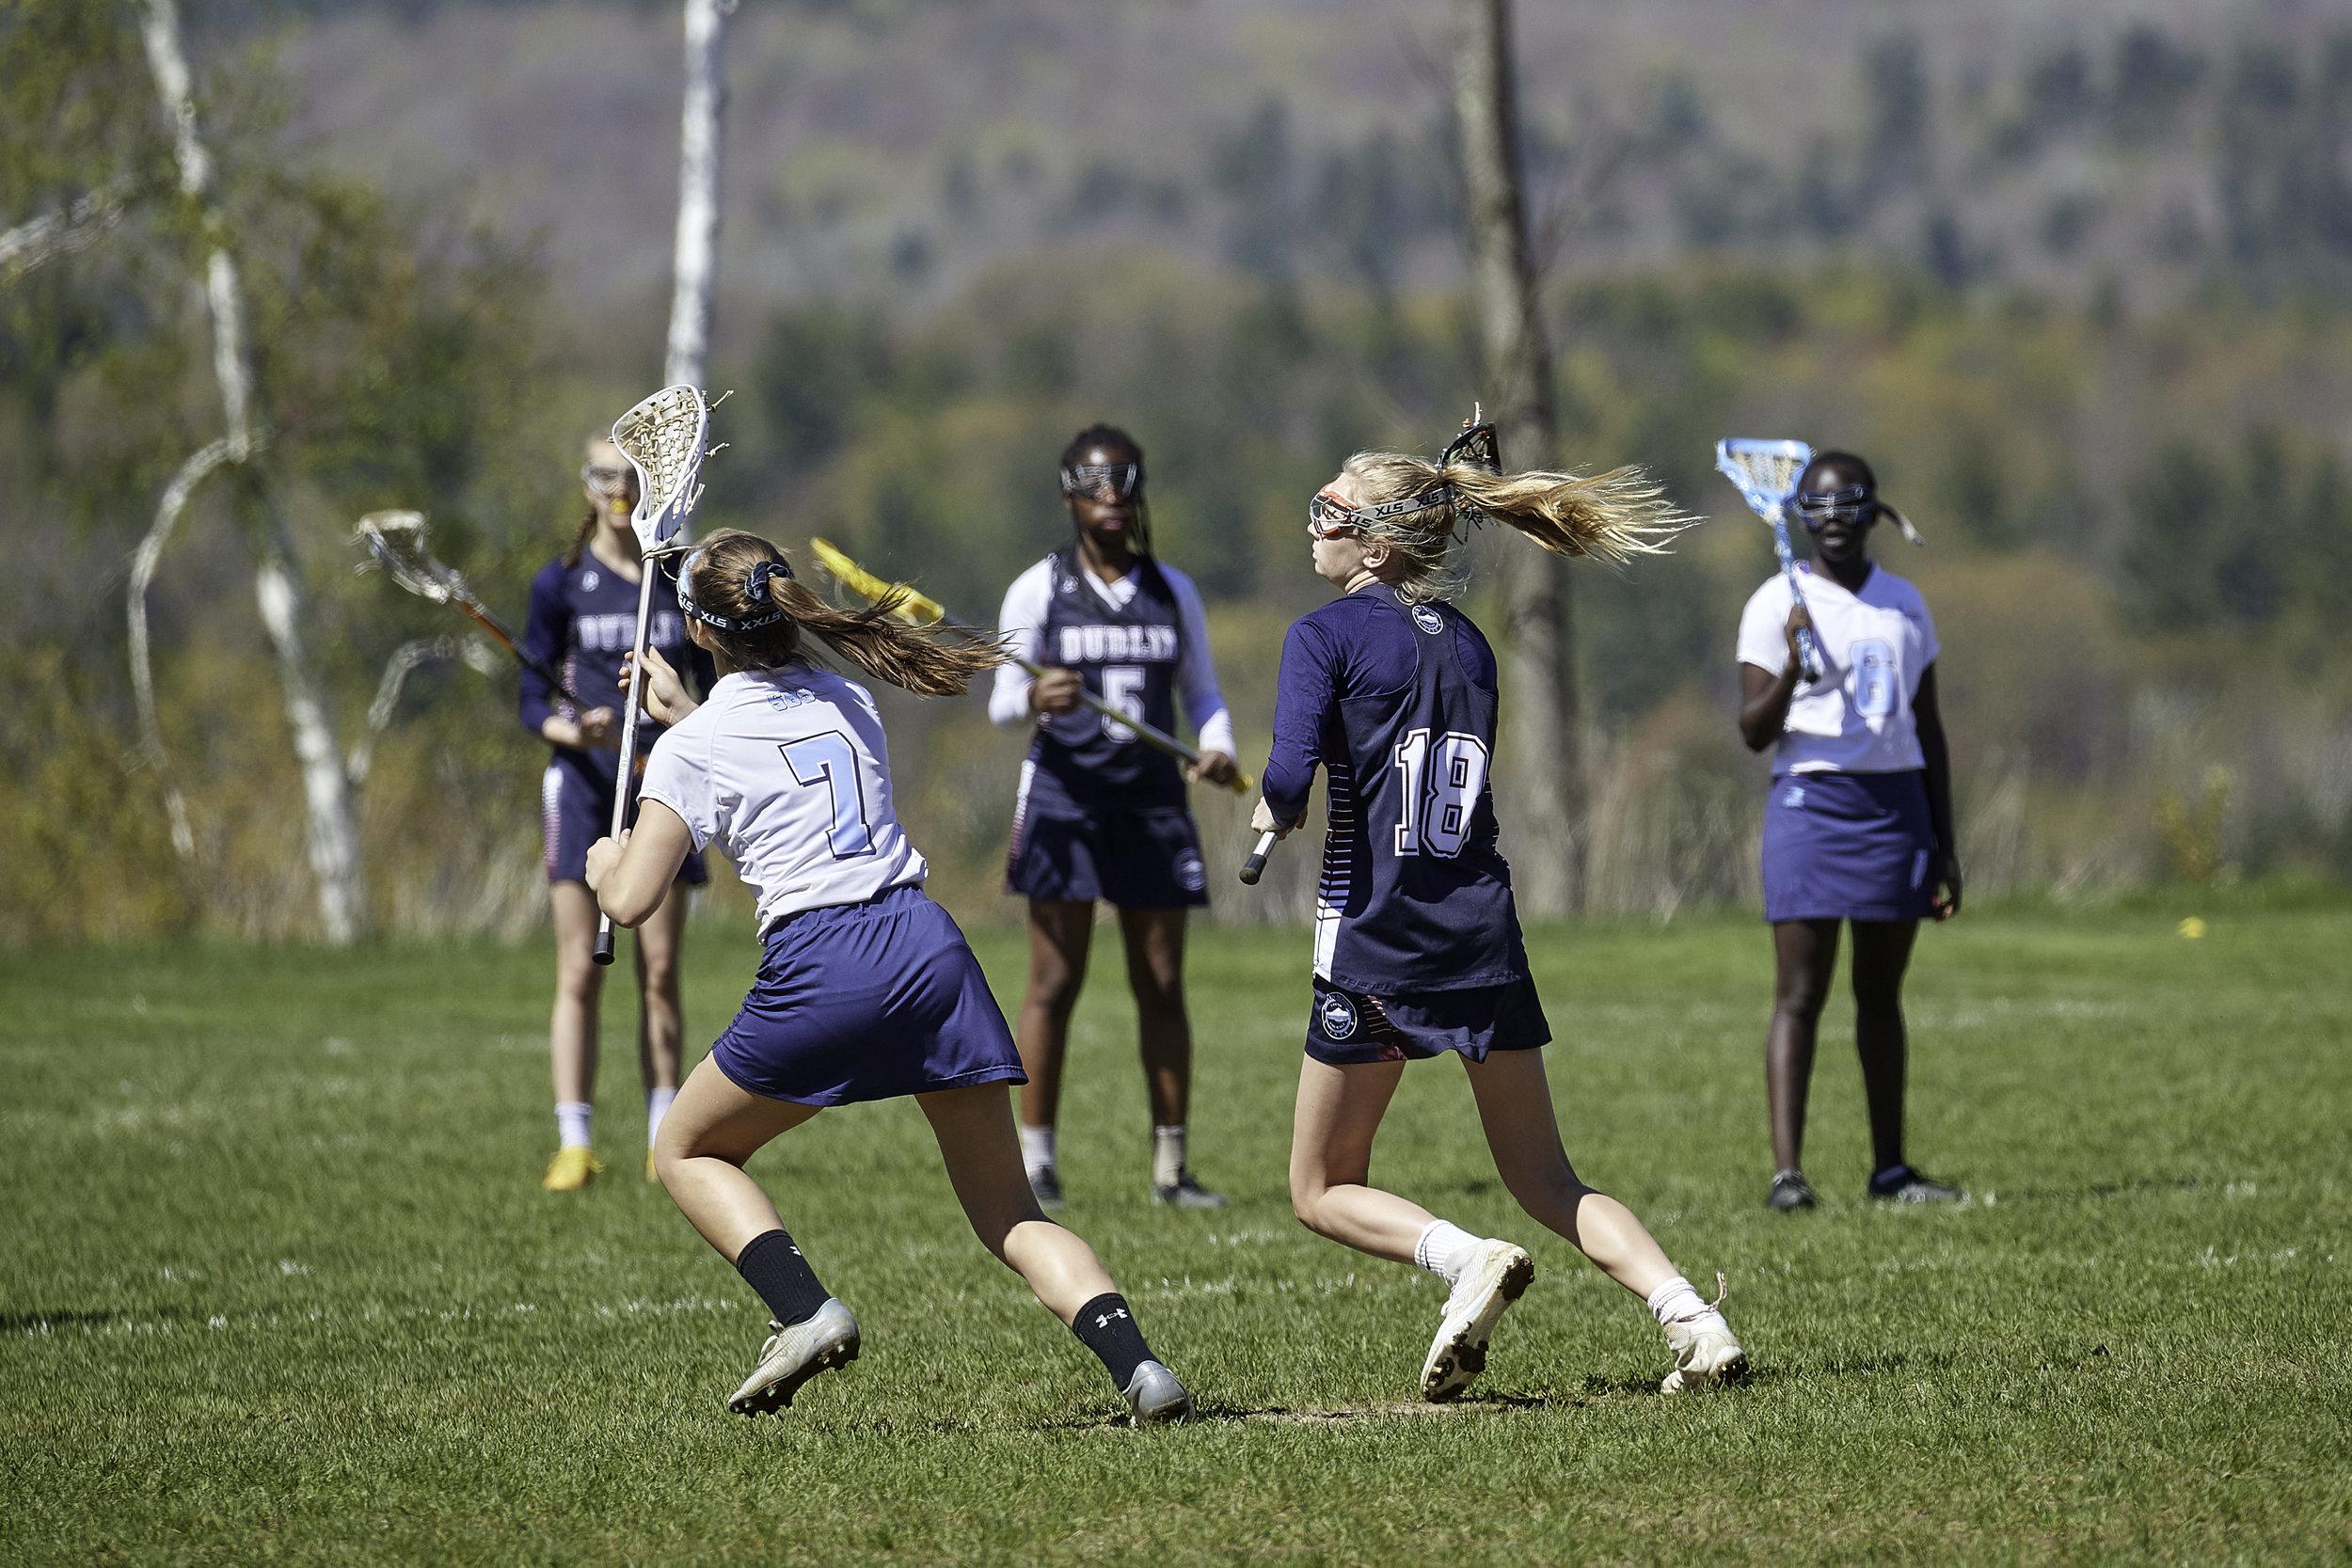 Girls Lacrosse vs. Stoneleigh Burnham School - May 11, 2019 - May 10, 2019193310.jpg